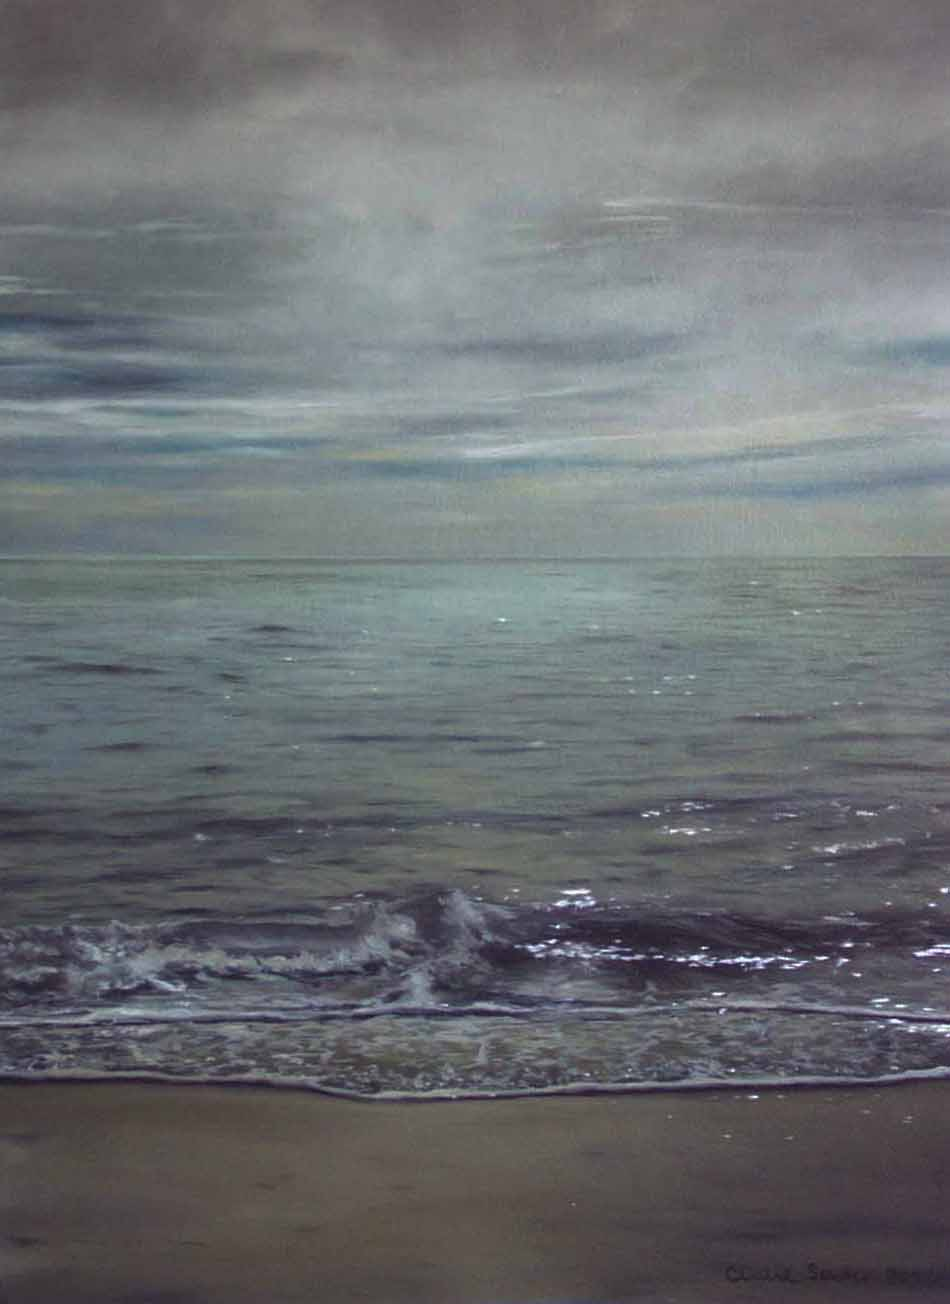 lapping shoreline 1